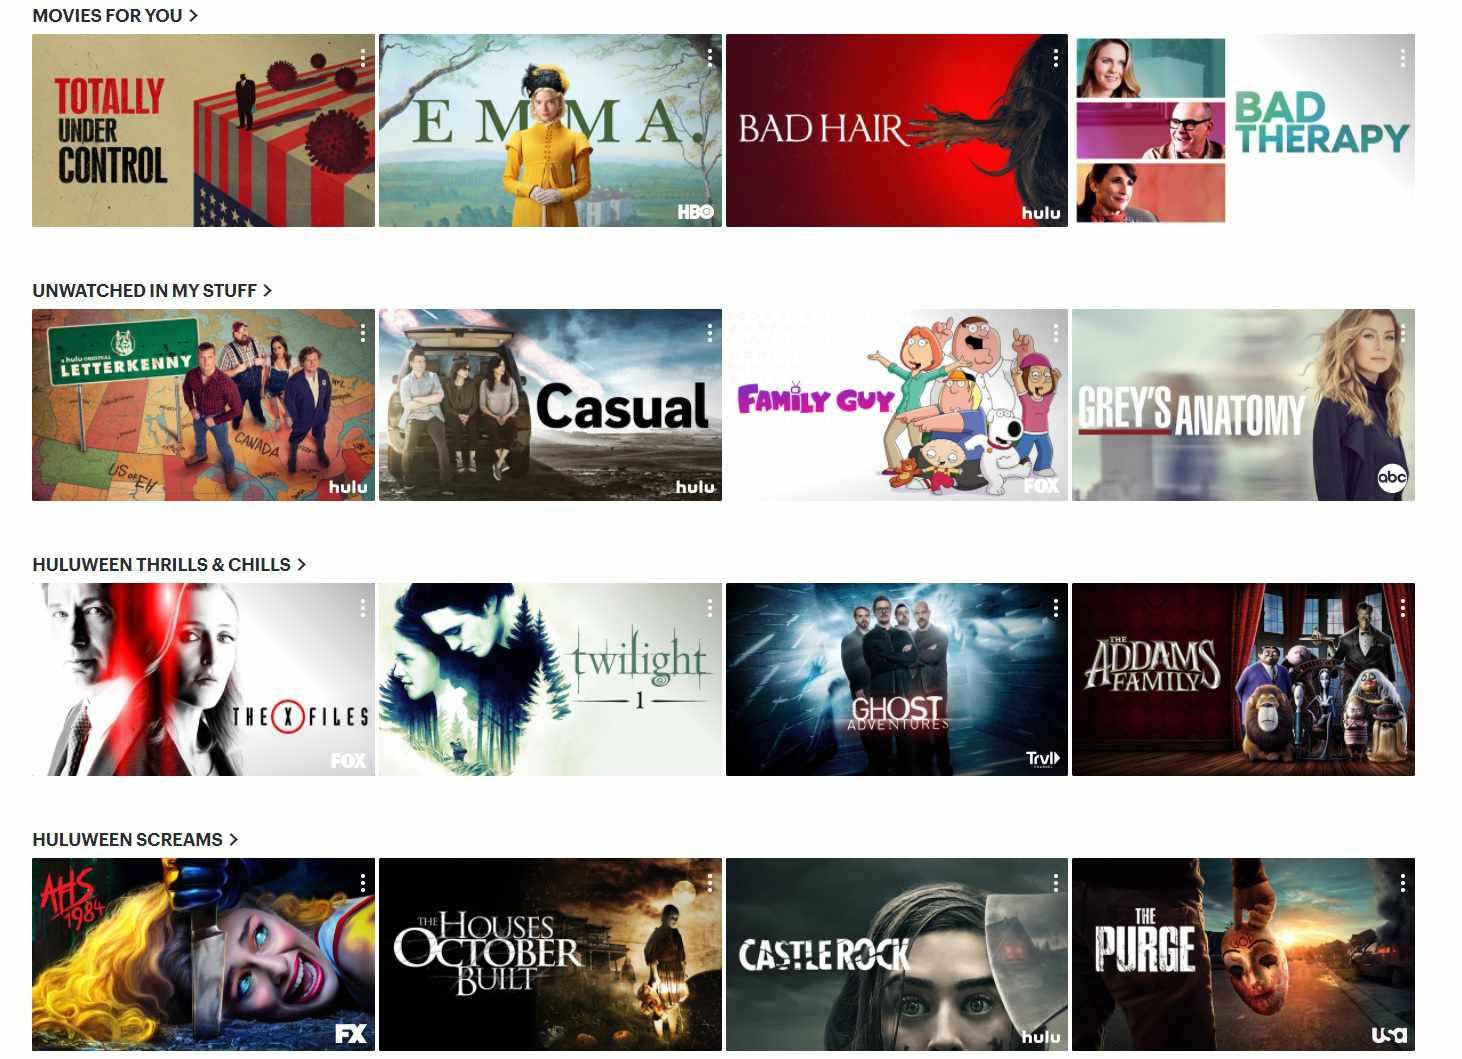 Hulu's homepage on a computer